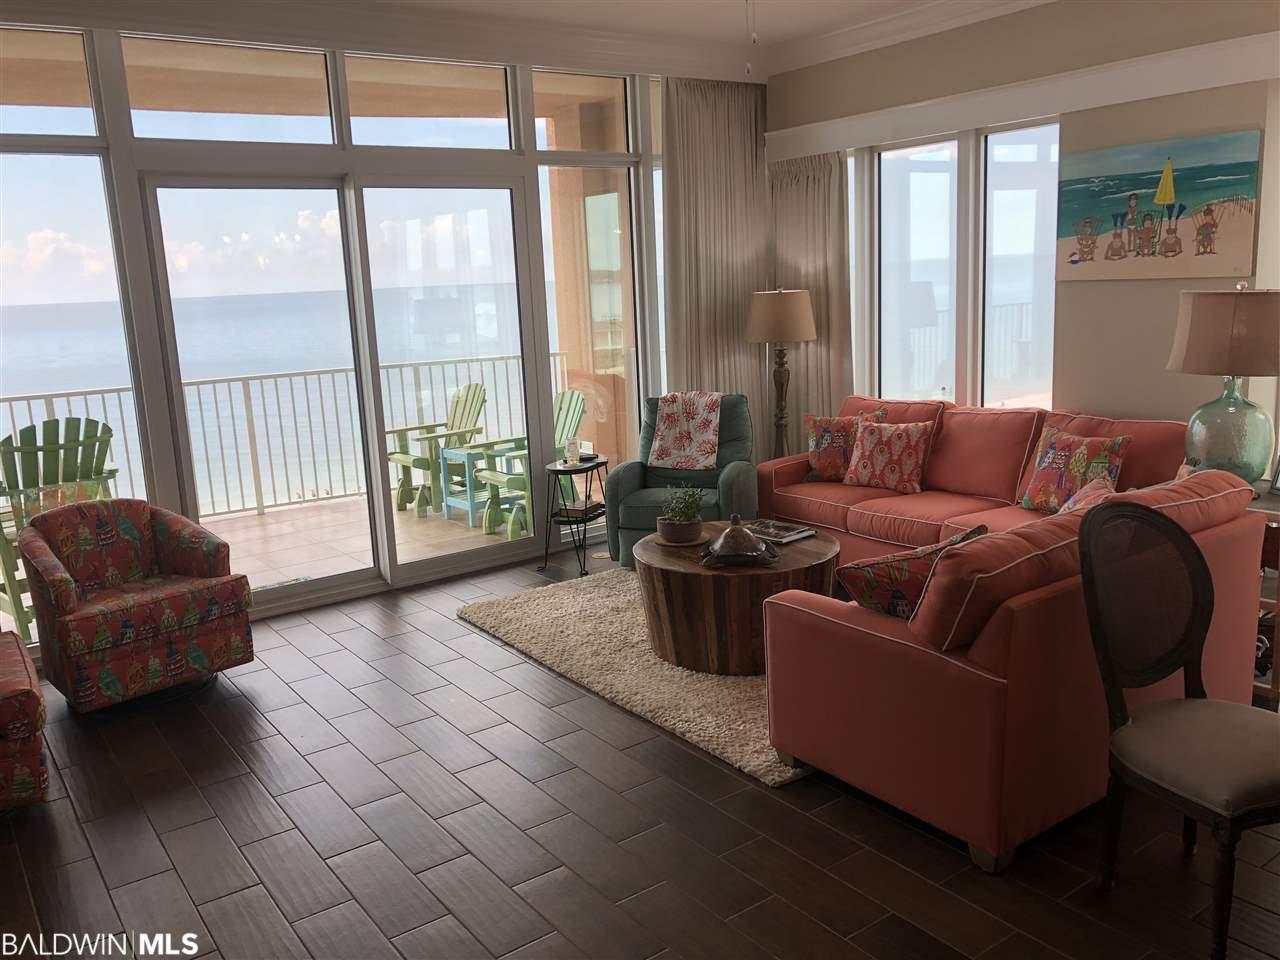 801 W Beach Blvd #501, Gulf Shores, AL 36542